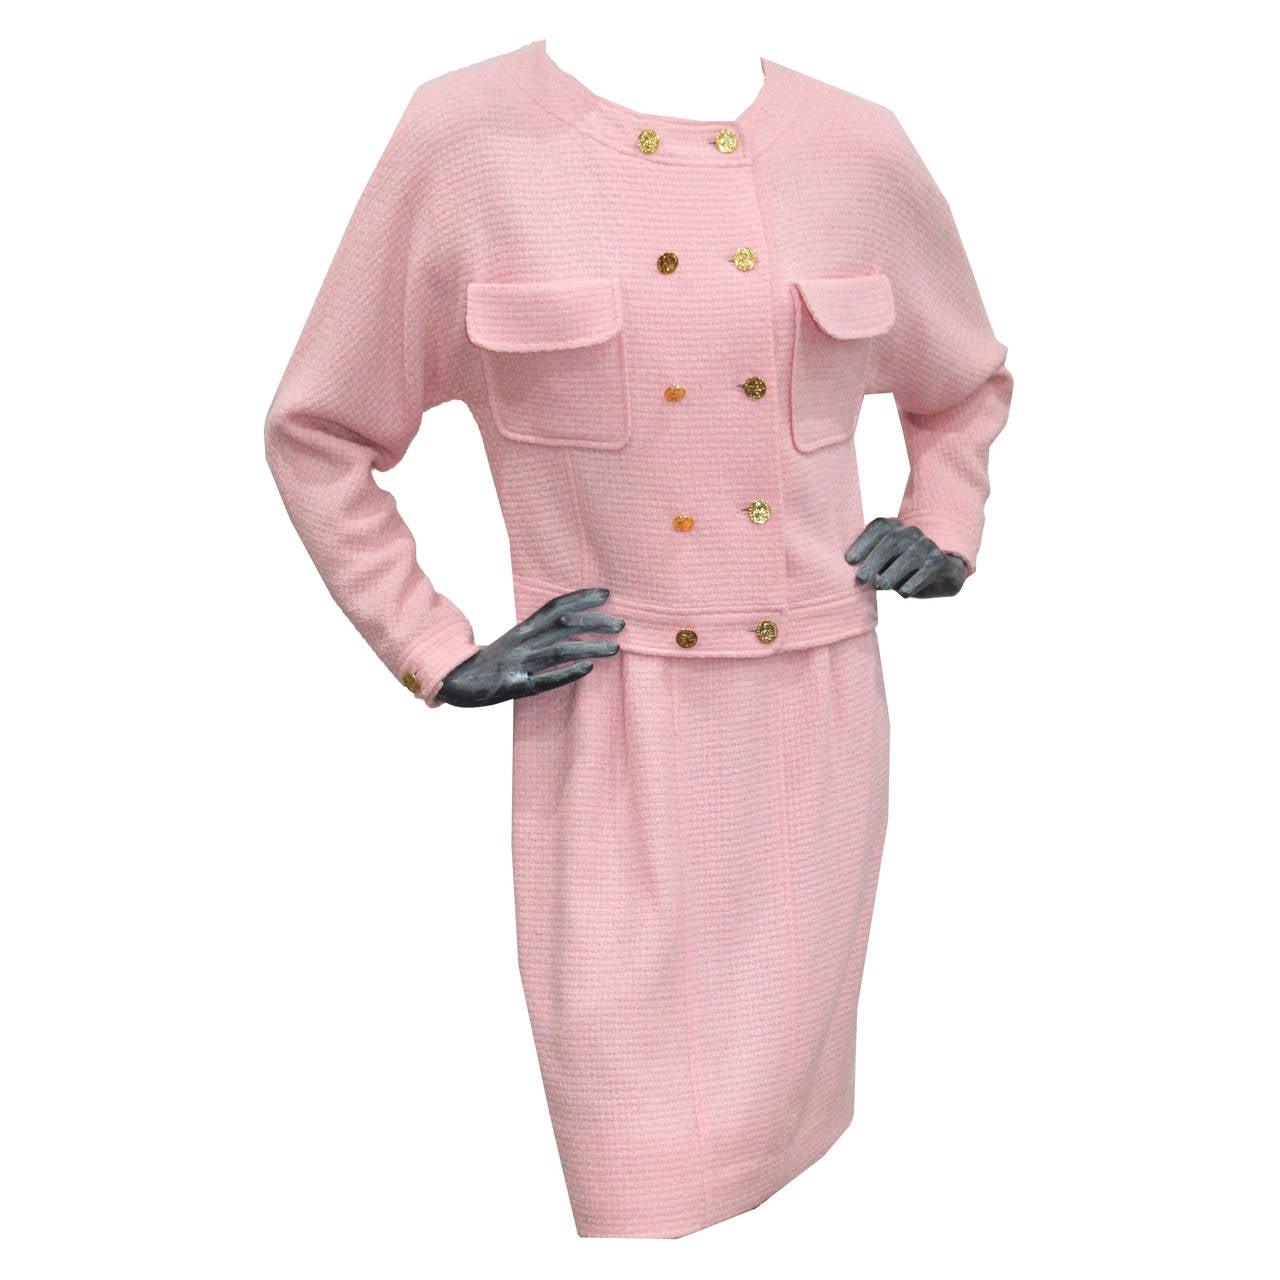 1980s Baby Pink Chanel Tweed 2 Piece Skirt Suit 1